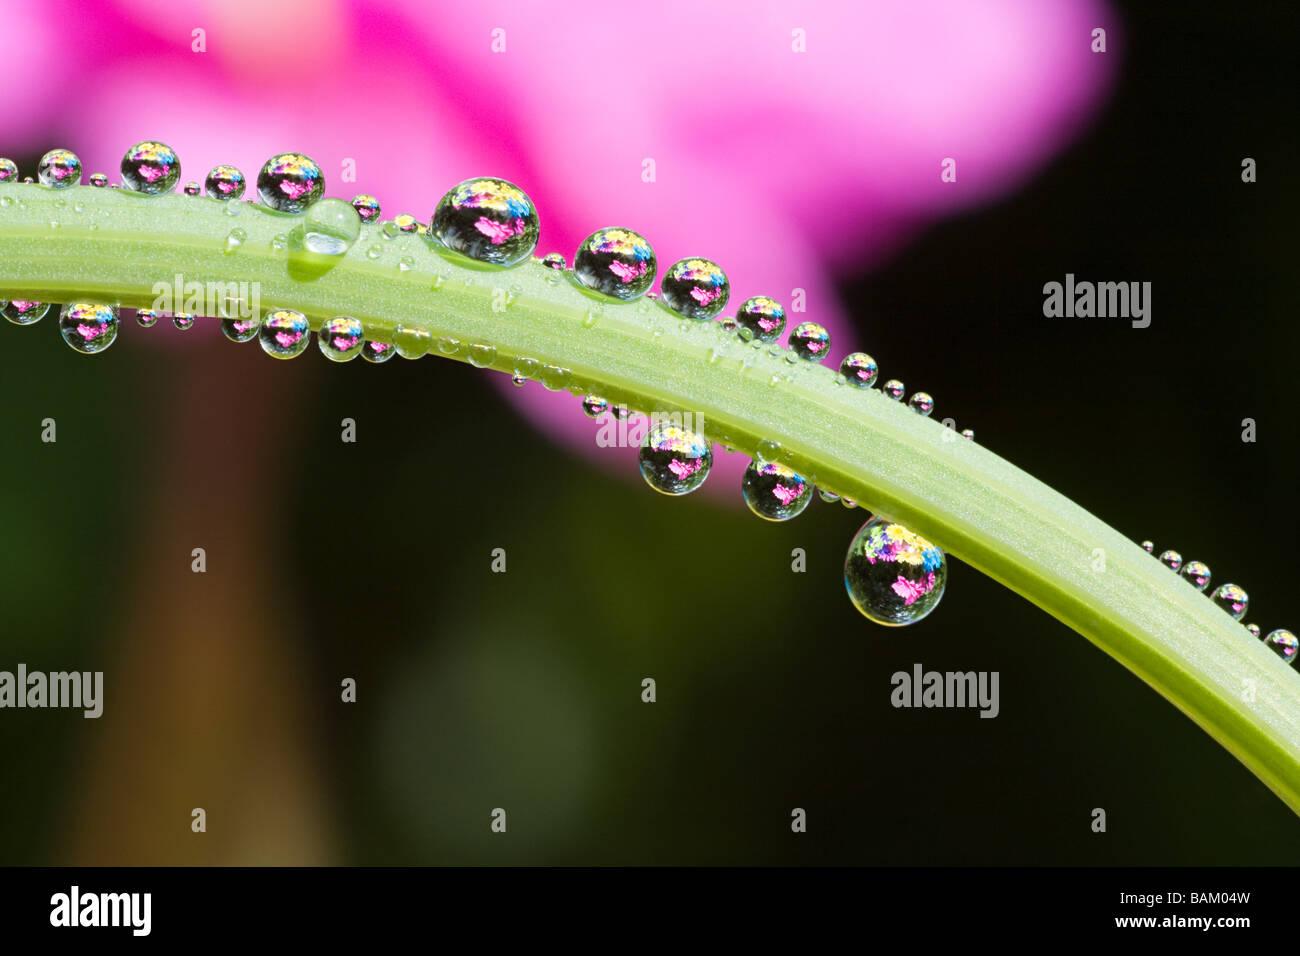 Dew droplets on a leaf - Stock Image